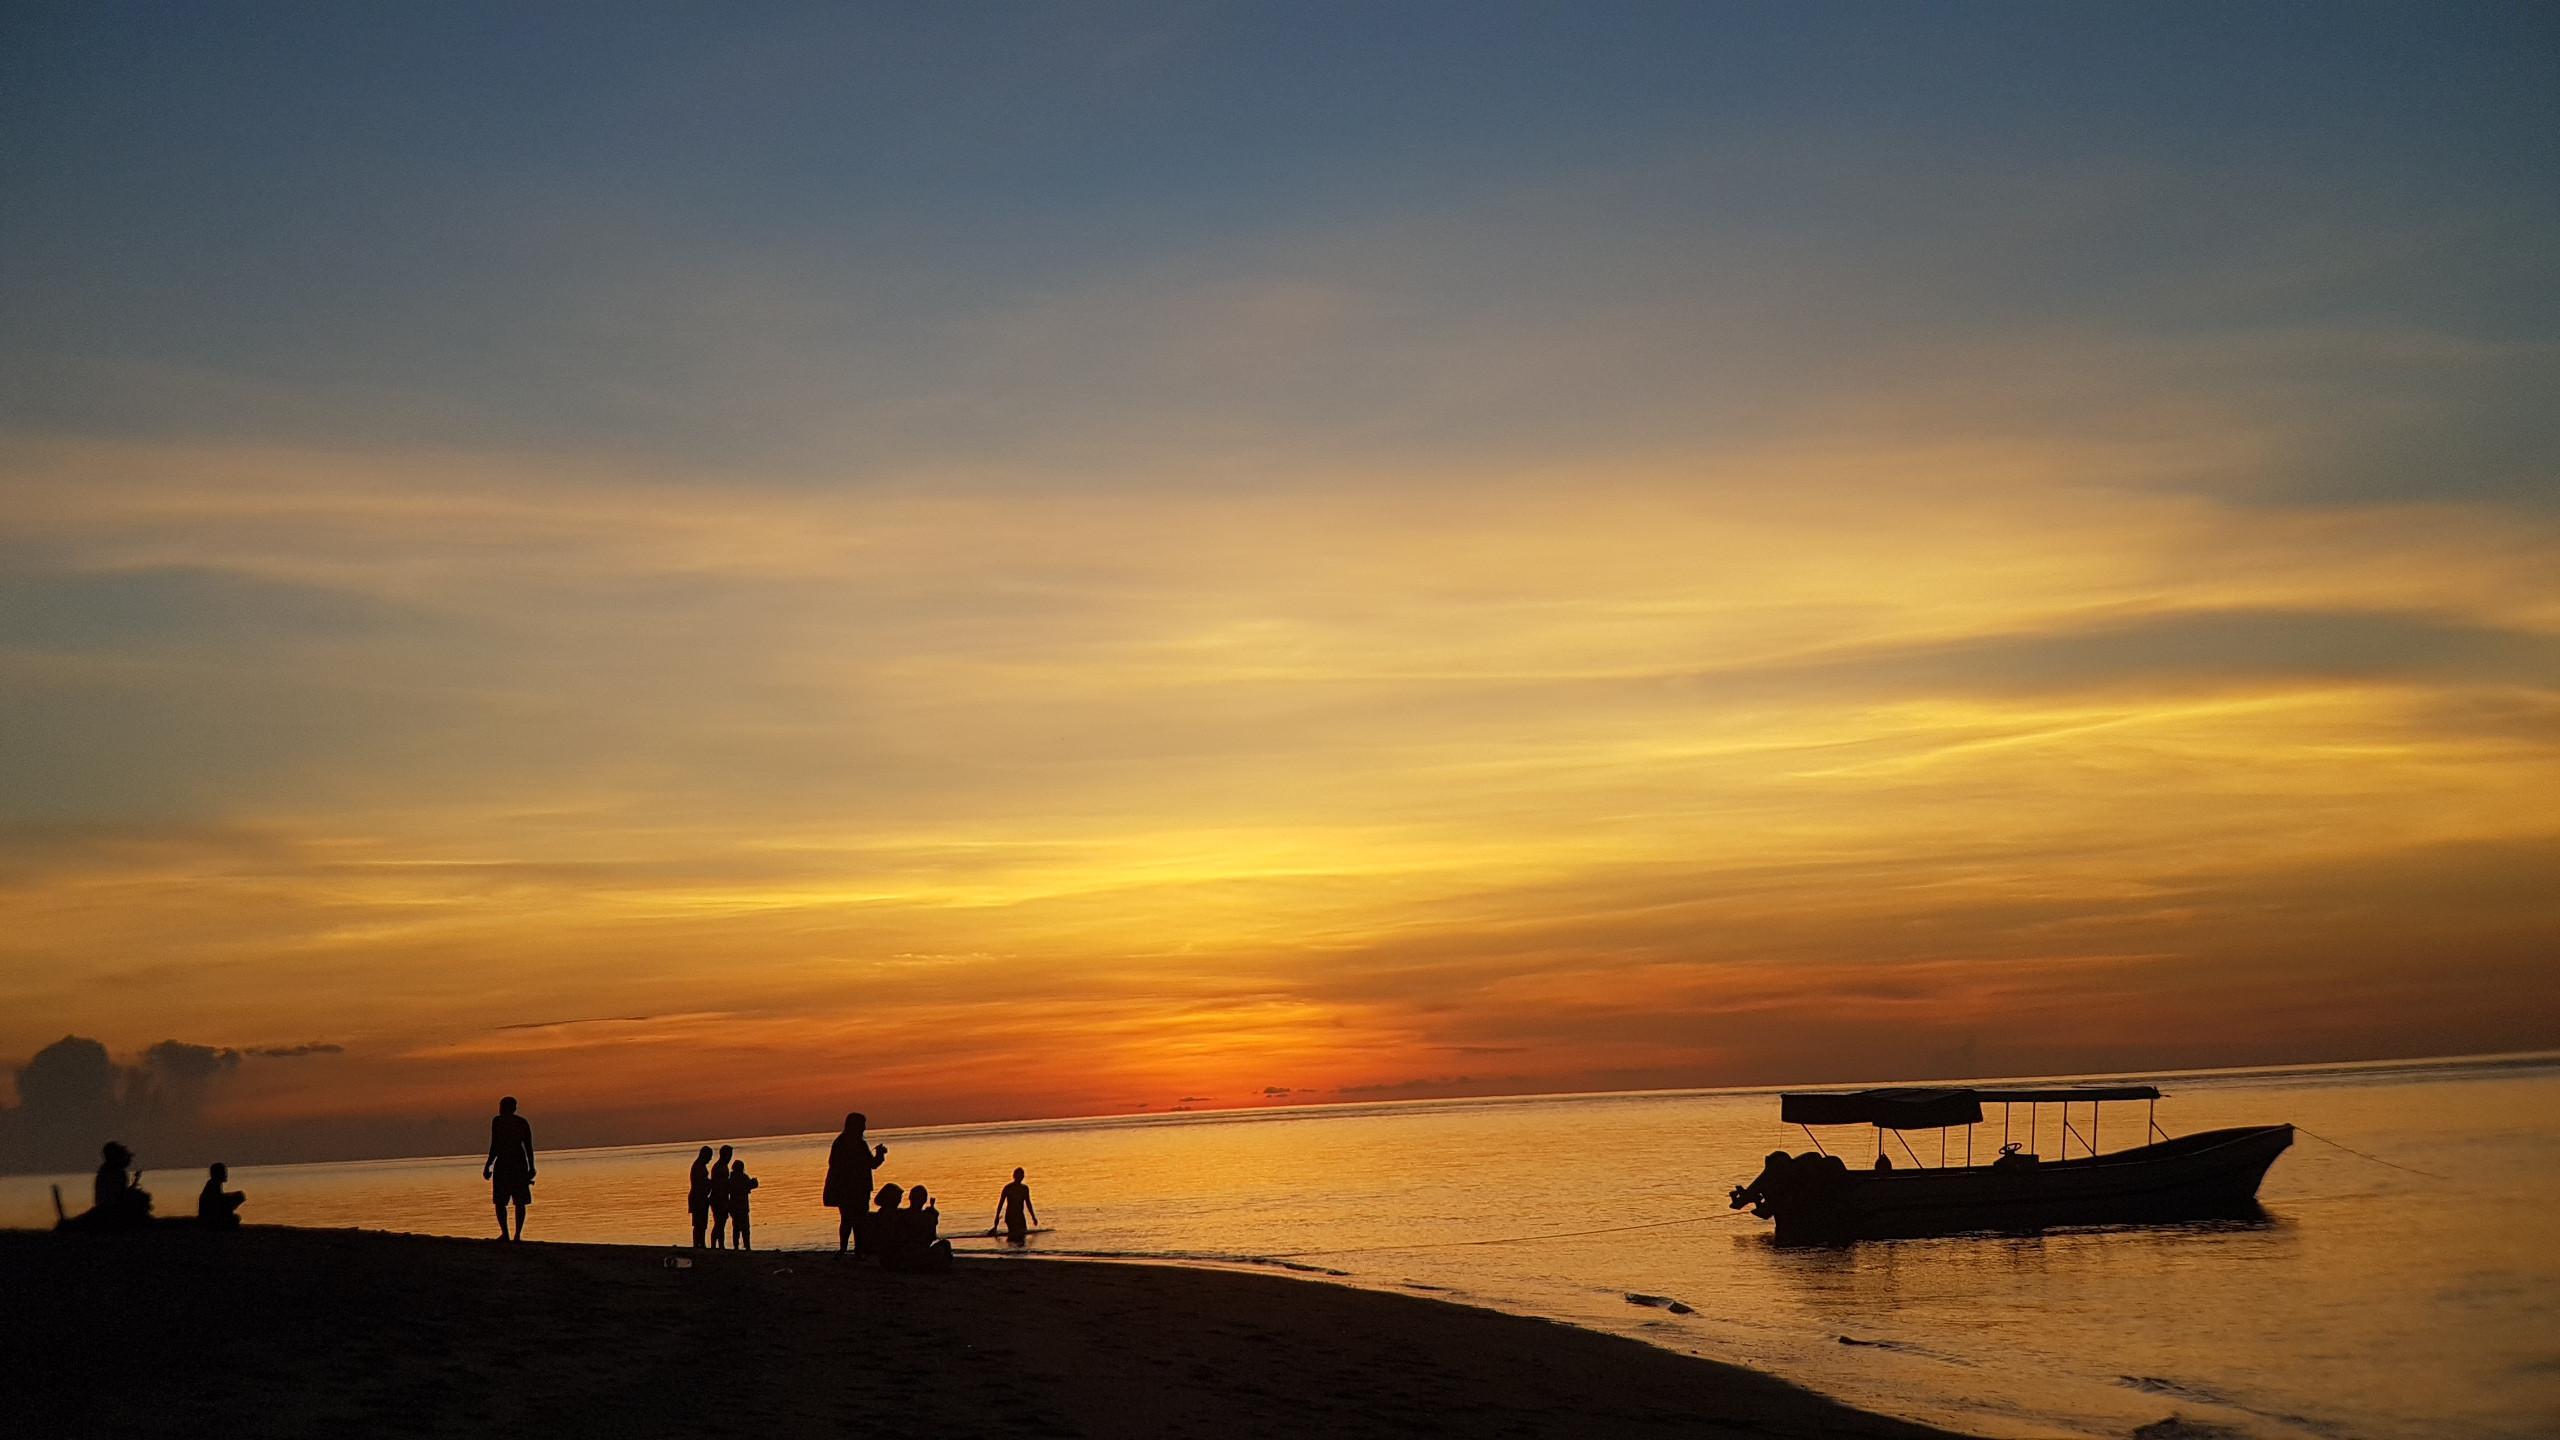 Menyaksikan matahari terbenam dari Pulau Hatta di Kecamatan Banda, Banda Neira, Maluku. (Liputan6.com/Aditya Eka Prawira)